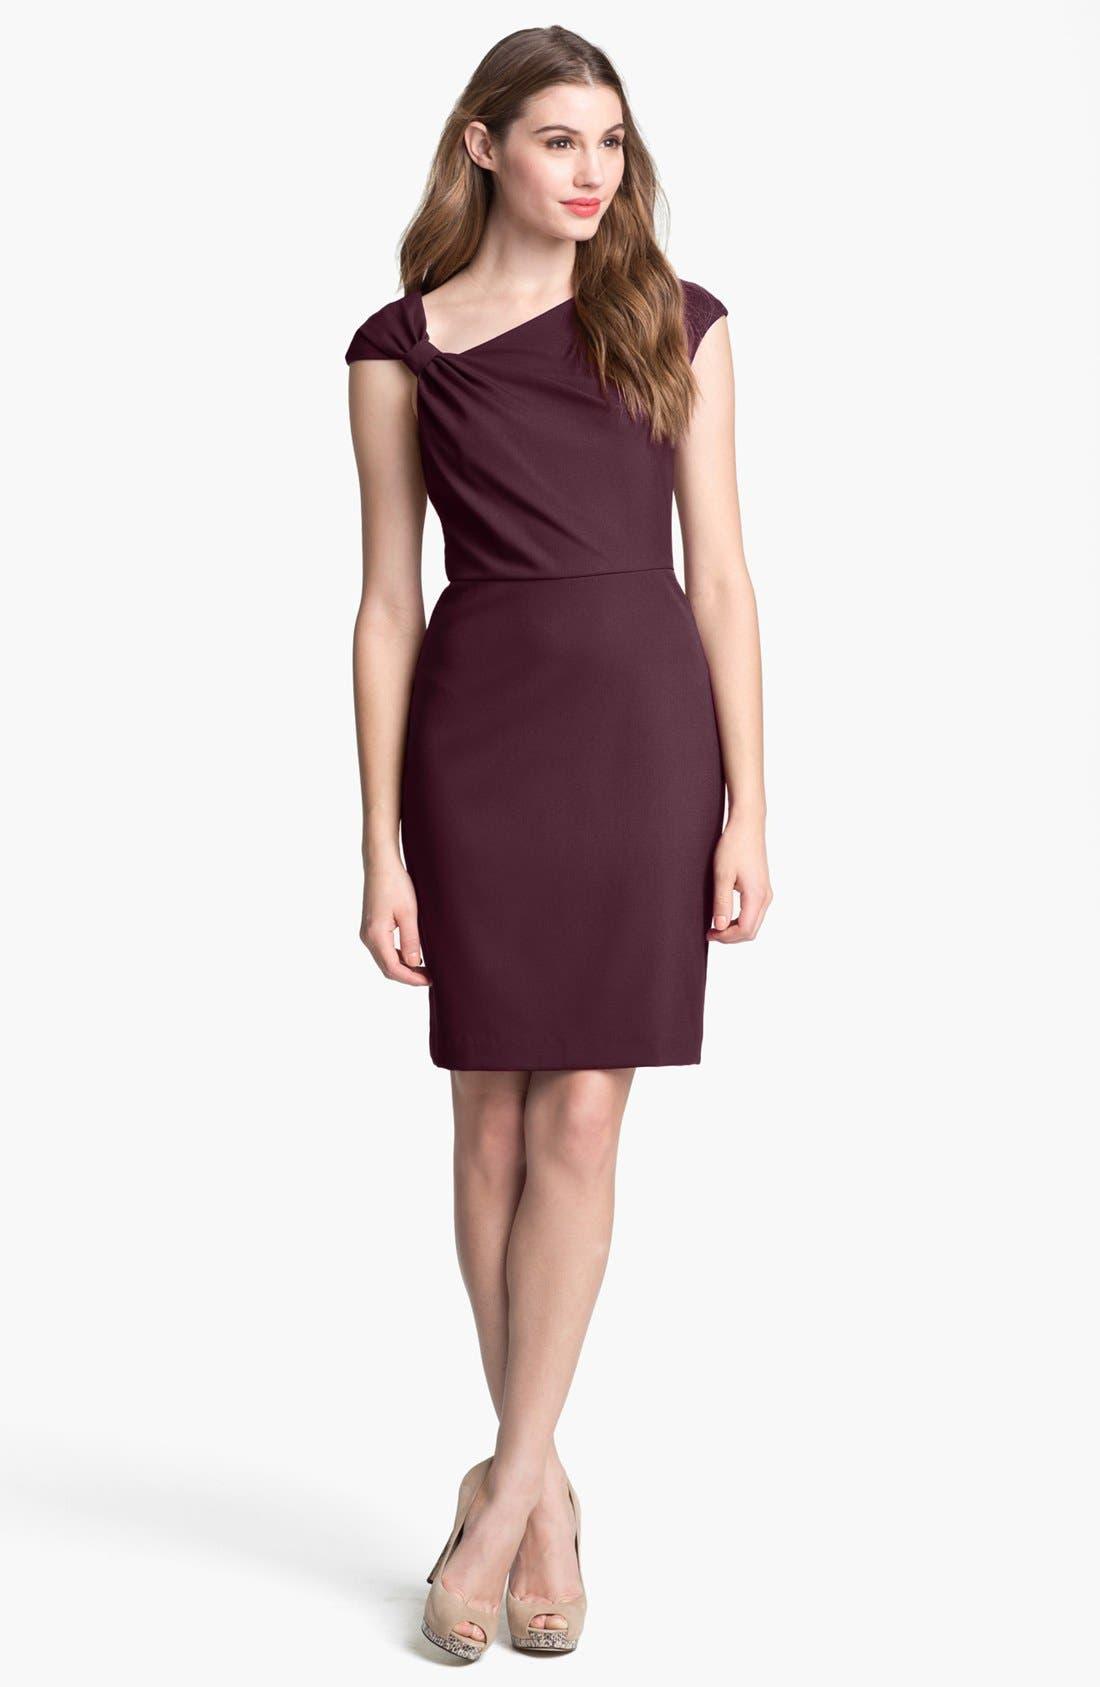 Alternate Image 1 Selected - Ivy & Blu Cap Sleeve Sheath Dress (Online Only)